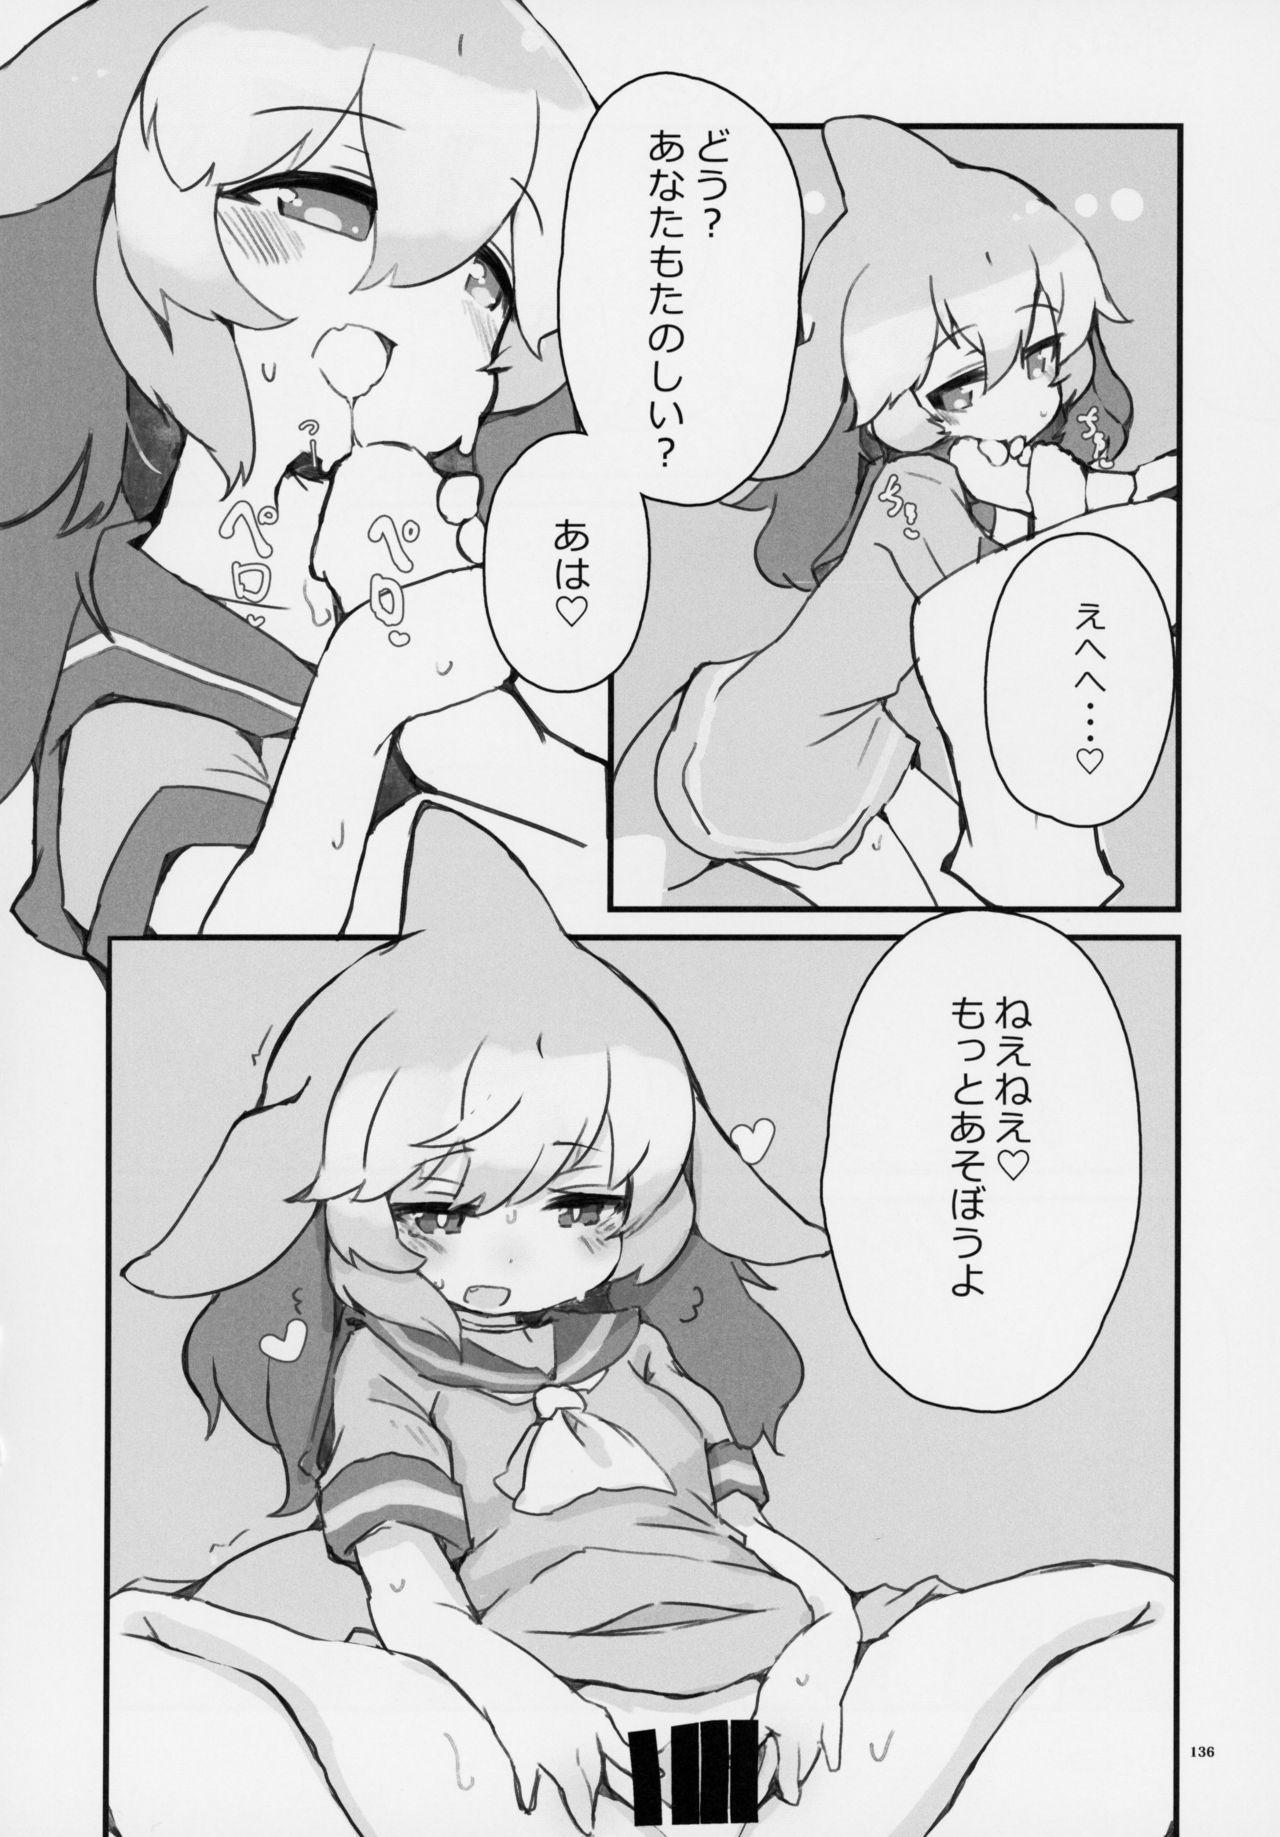 Friends Gyaku Rape Goudoushi 134